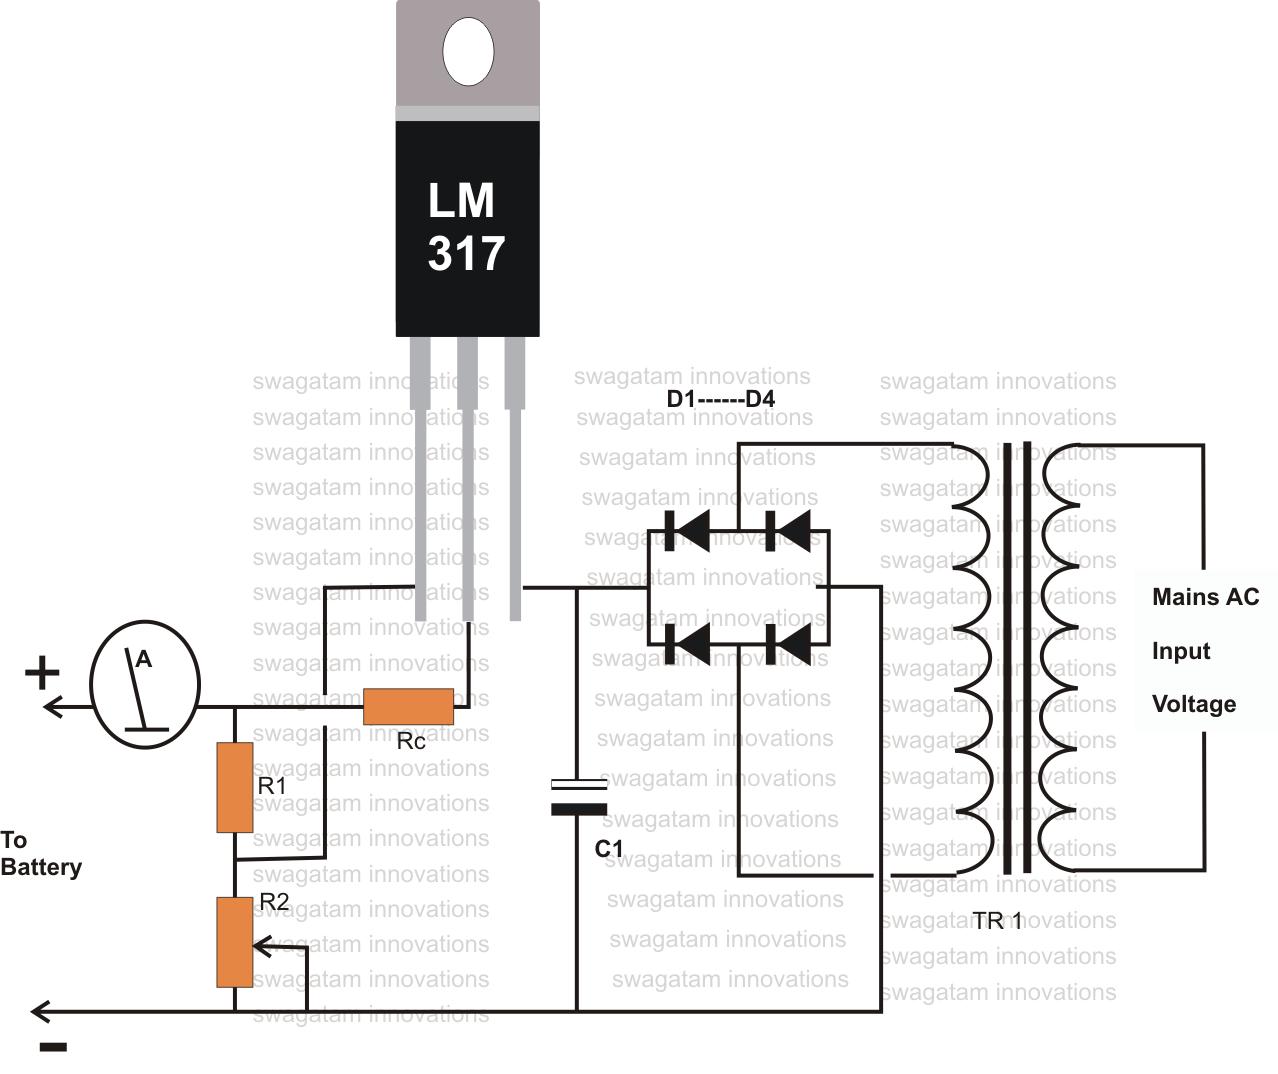 12 Volt Battery Charger Diagram | Electronic | Pinterest